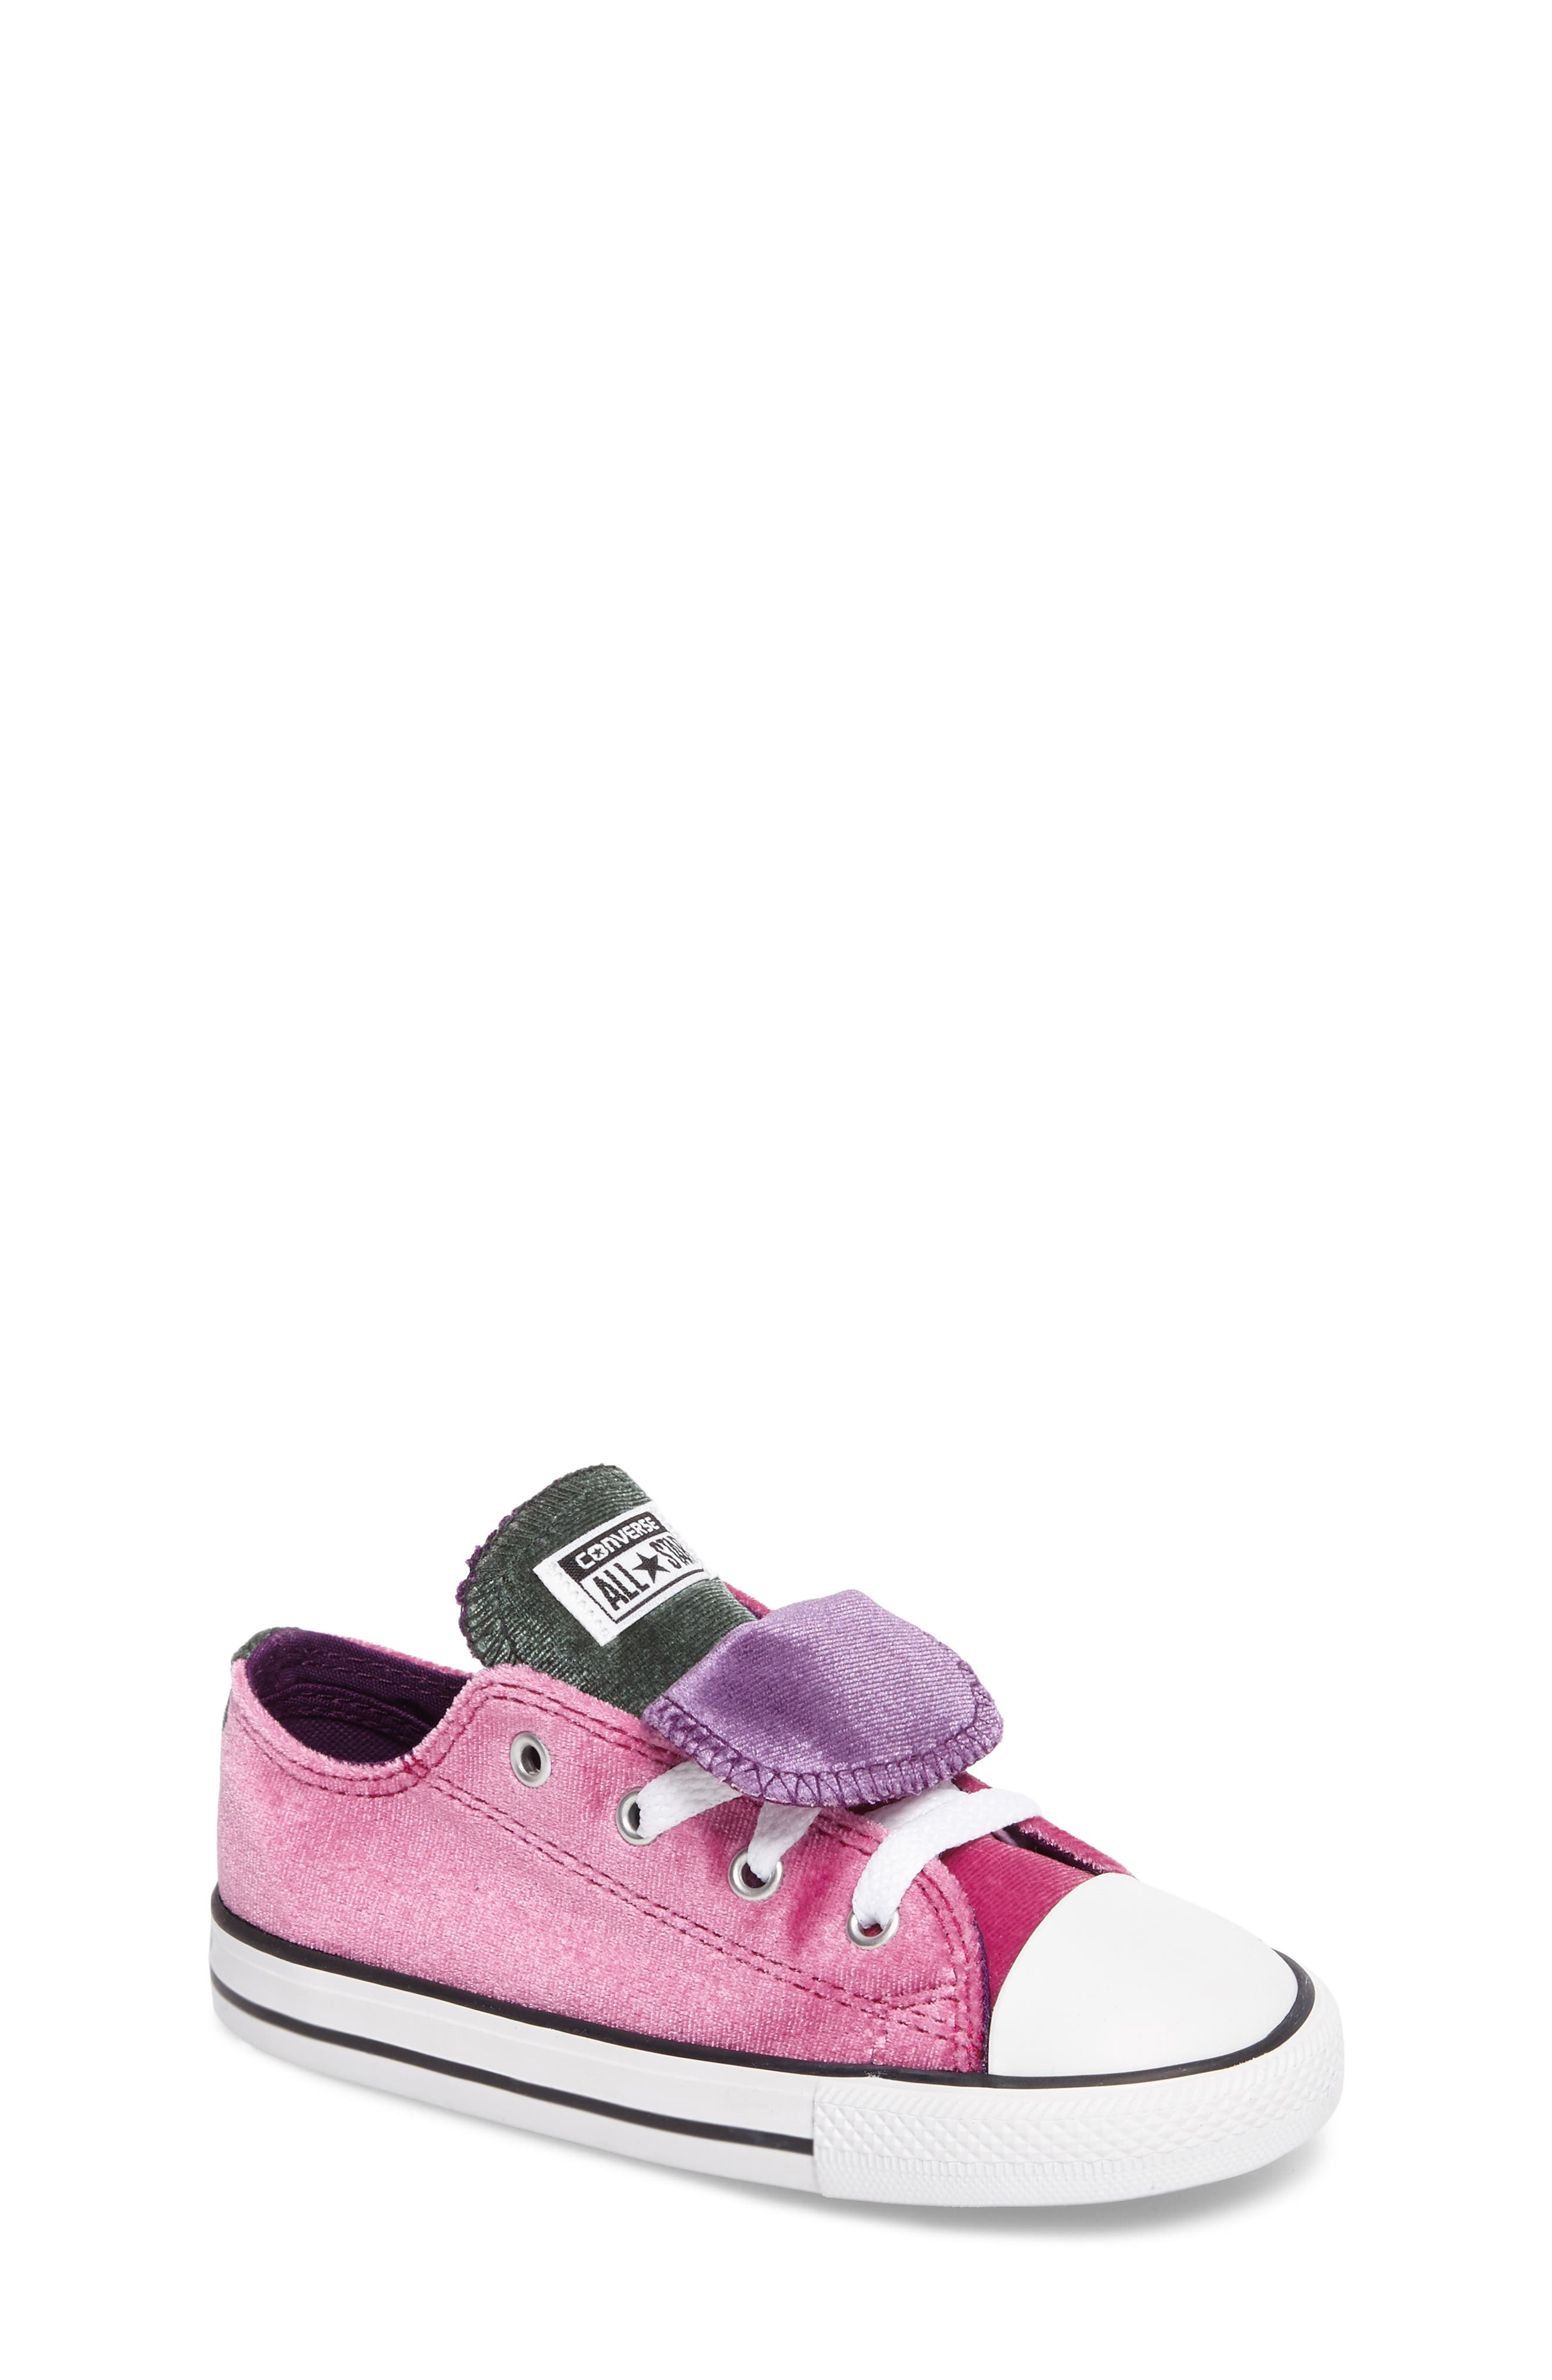 Alternate Image 1 Selected - Converse All Star® Velvet Double Tongue Sneaker (Baby, Walker & Toddler)